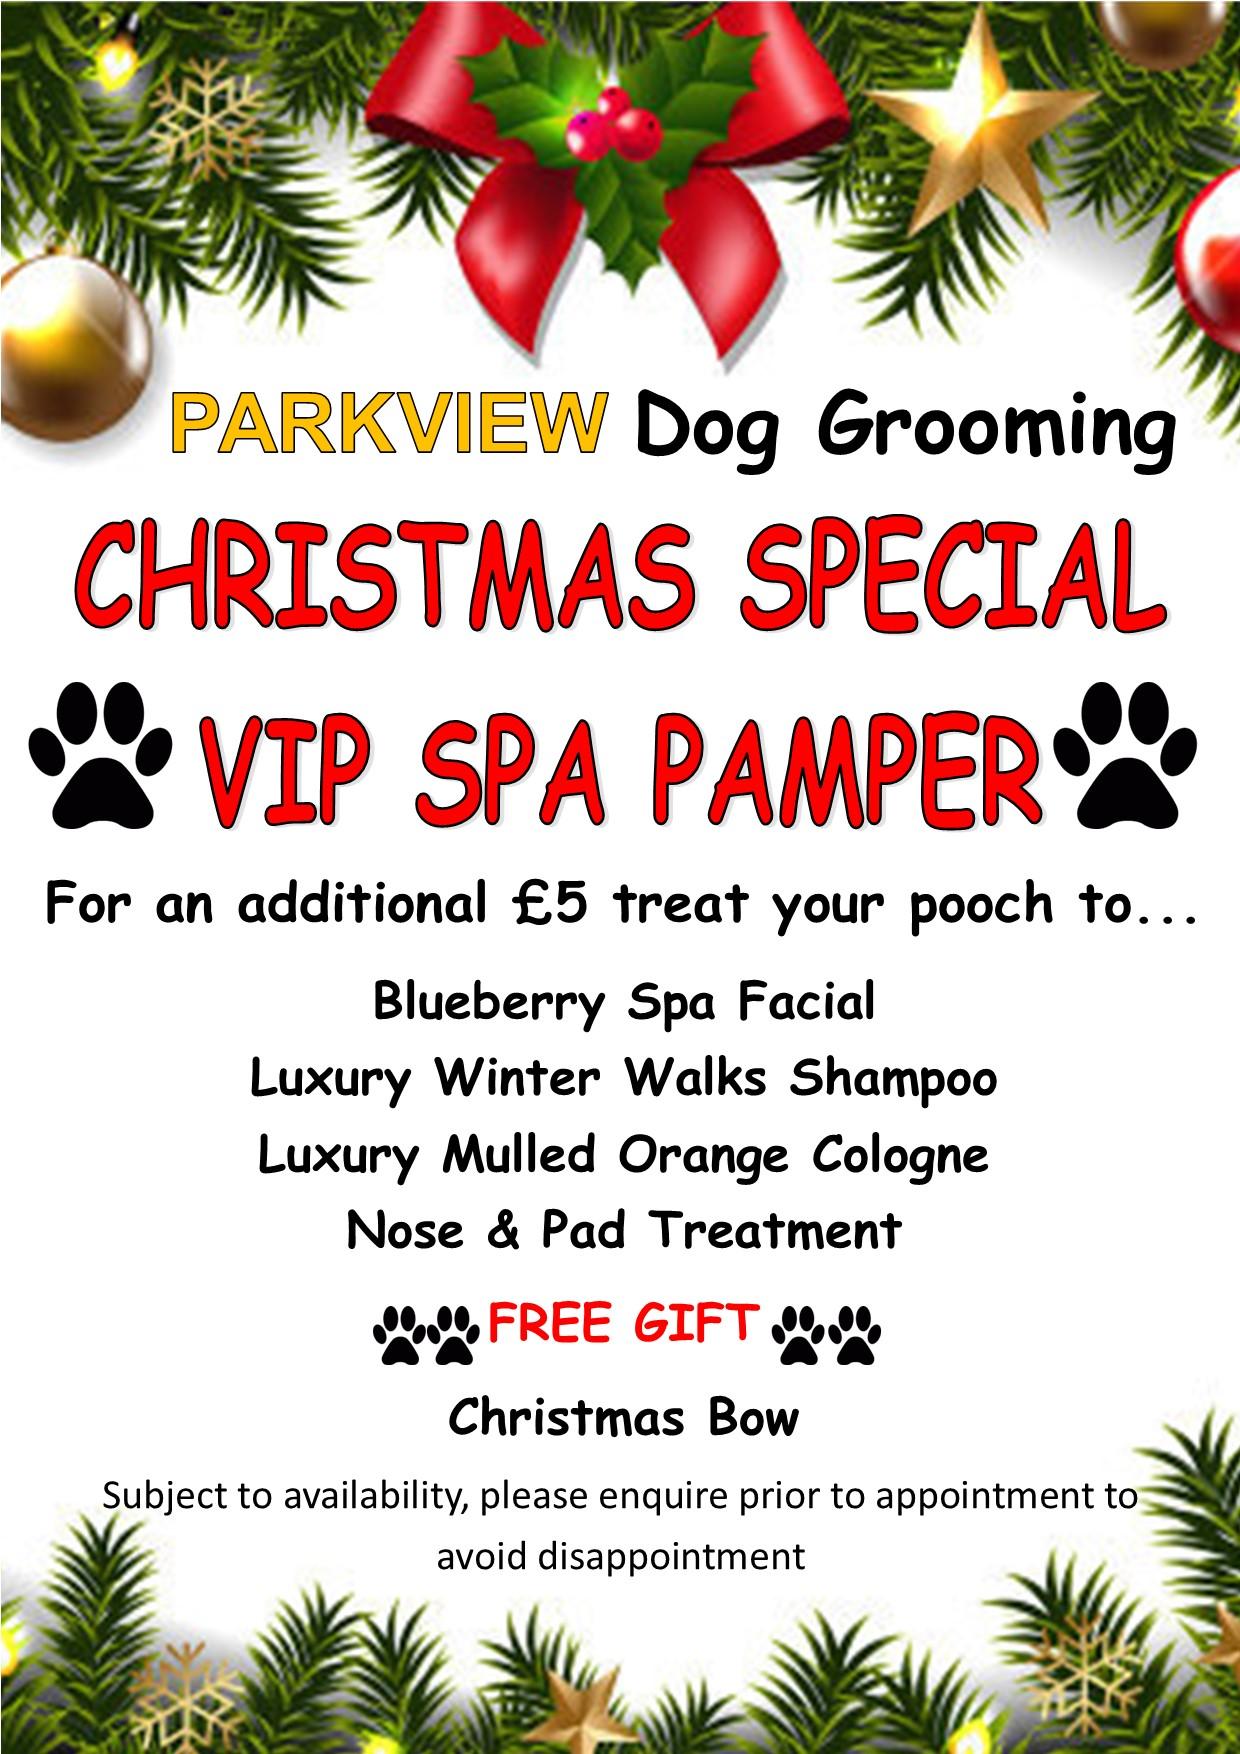 Christmas VIP Pamper